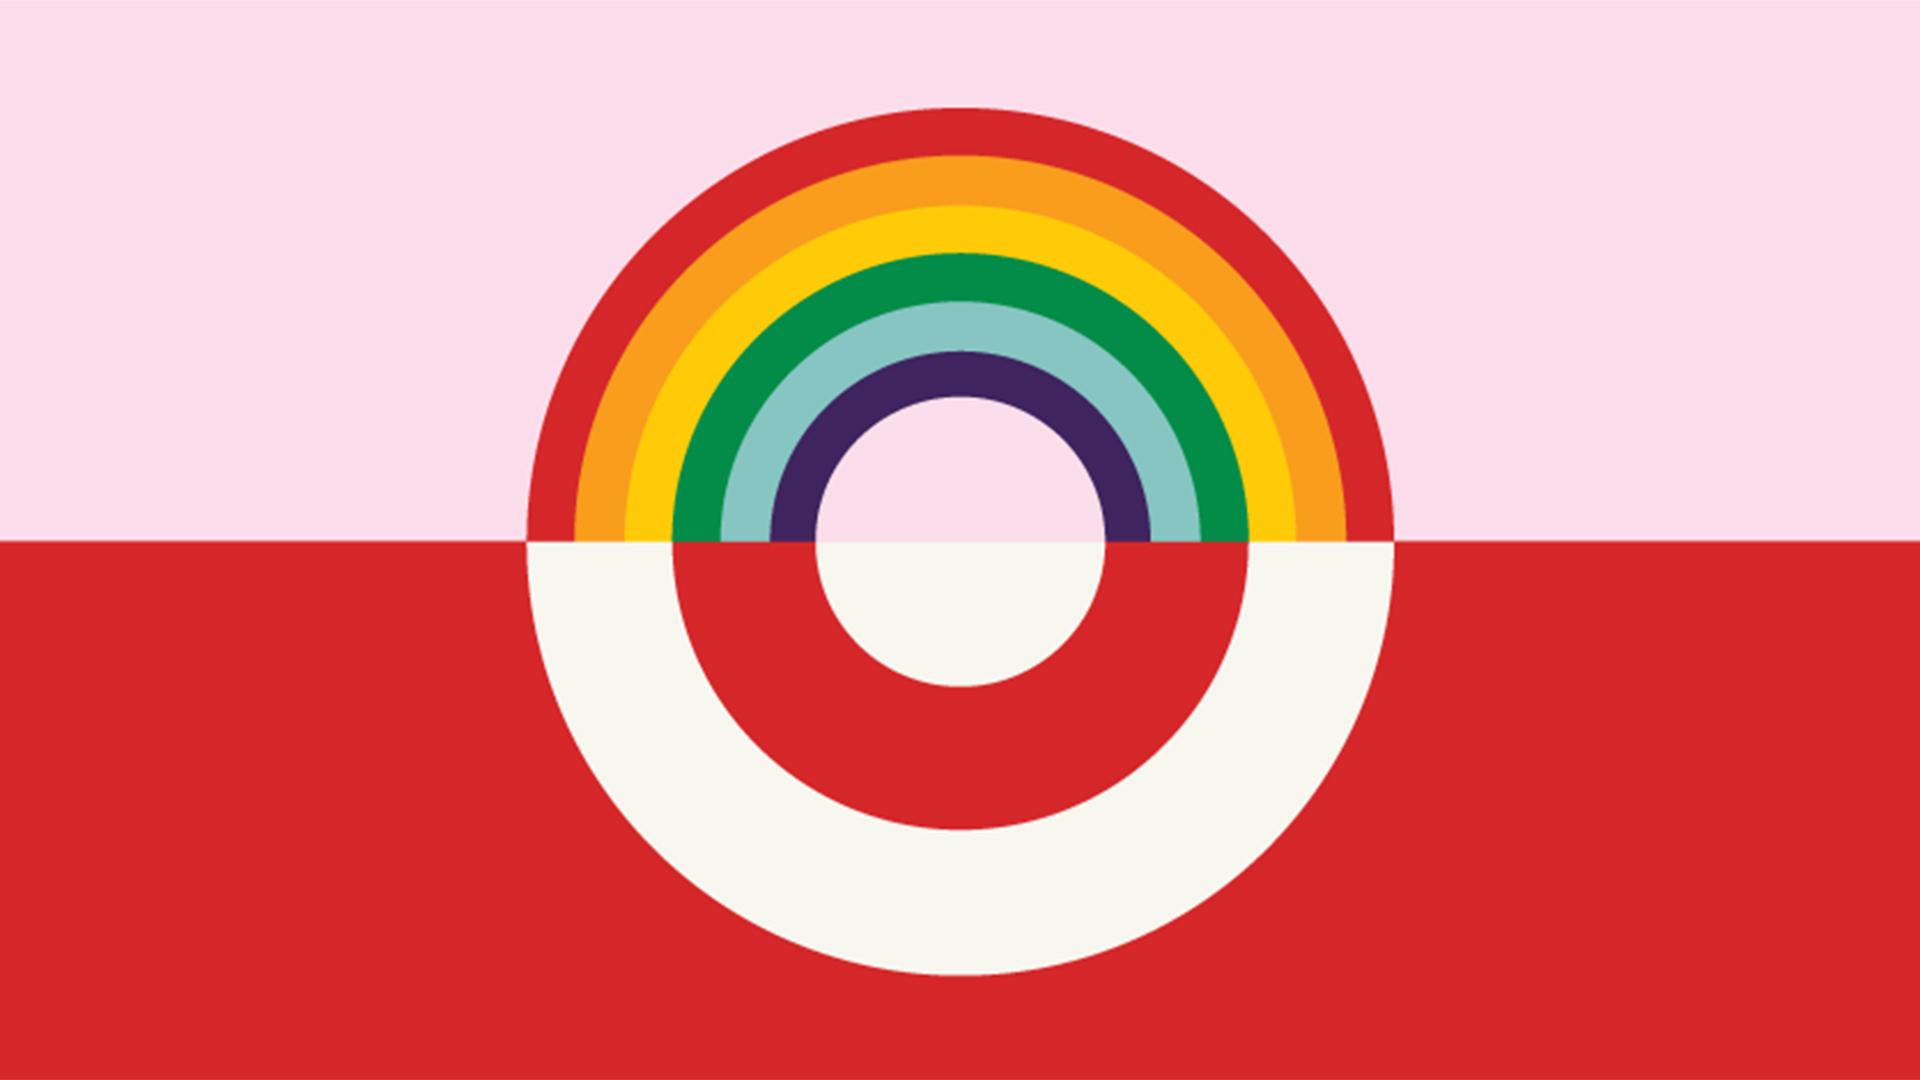 Target Takes An Inclusive Stand On Transgender Bathroom Debate - Transgender bathrooms